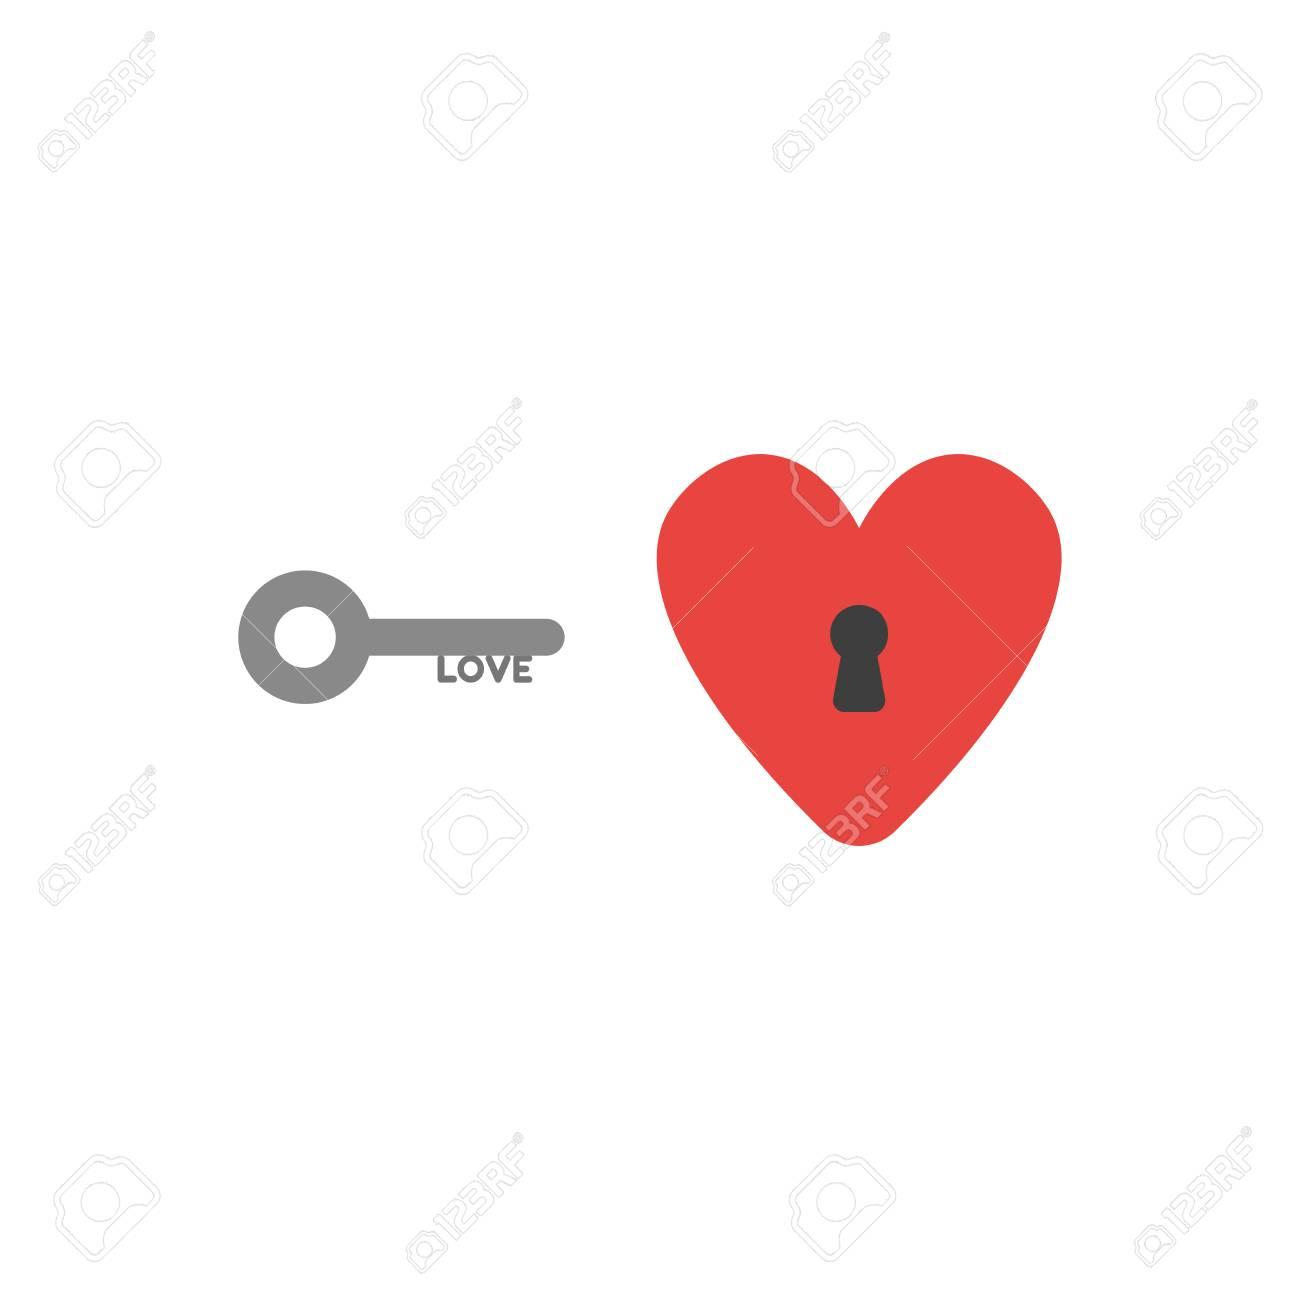 Flat Design Style Vector Illustration Concept Of Grey Love Key